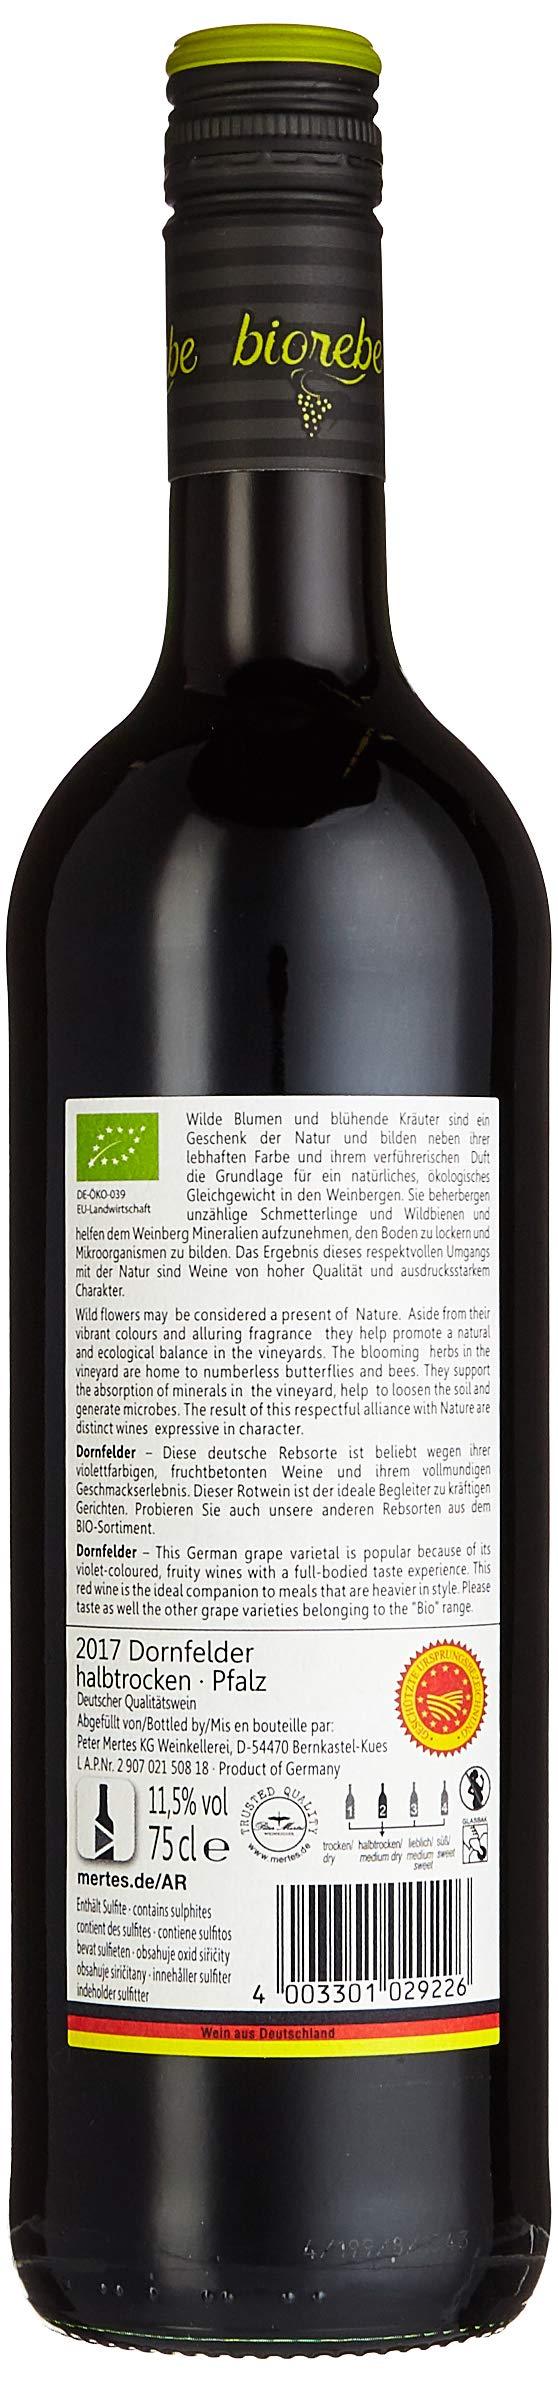 BIOrebe-Dornfelder-Rotwein-Qualittswein-2016-6-x-075-l